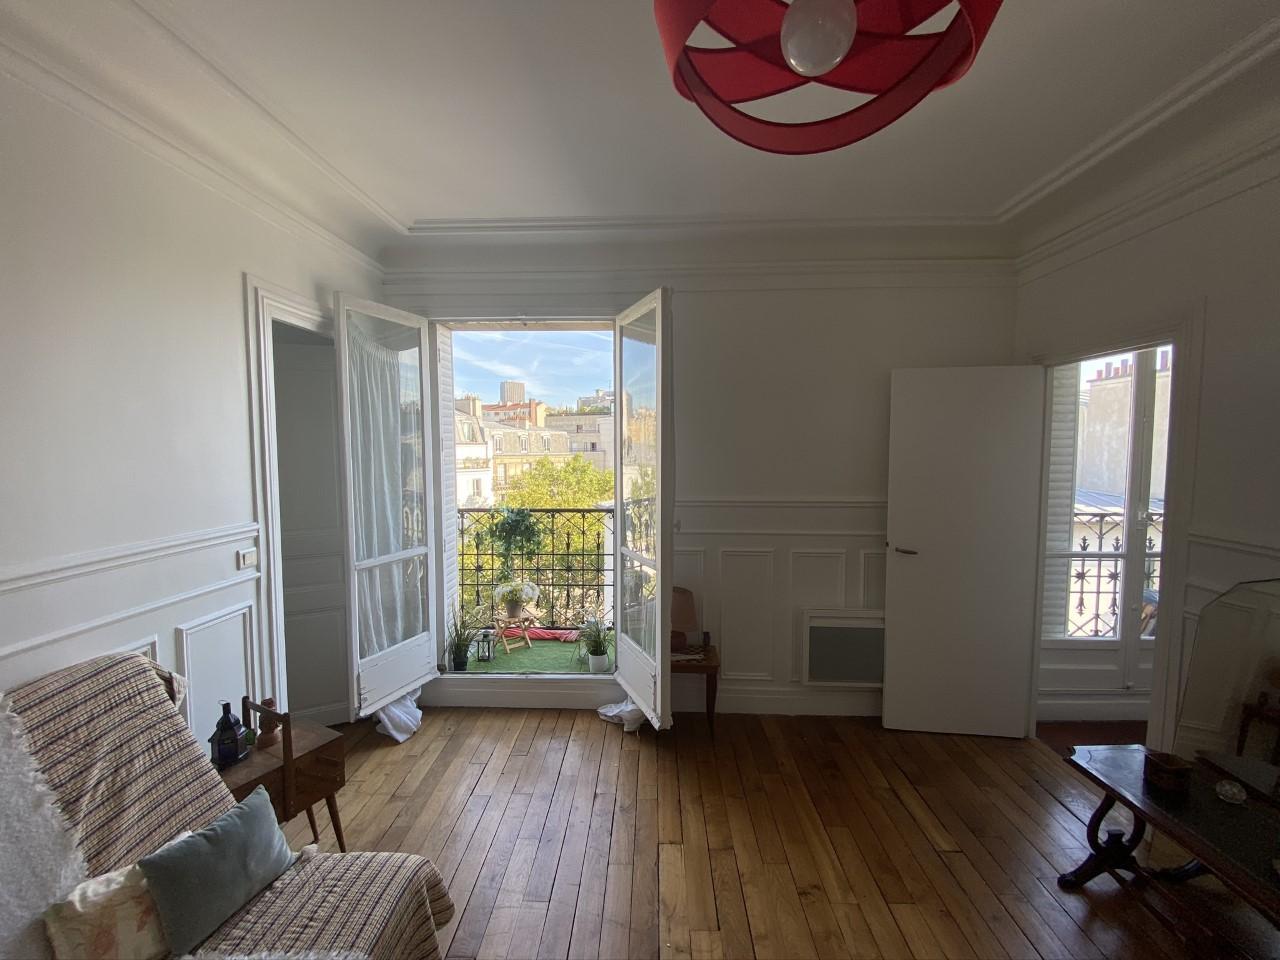 Living room 2 - Salon